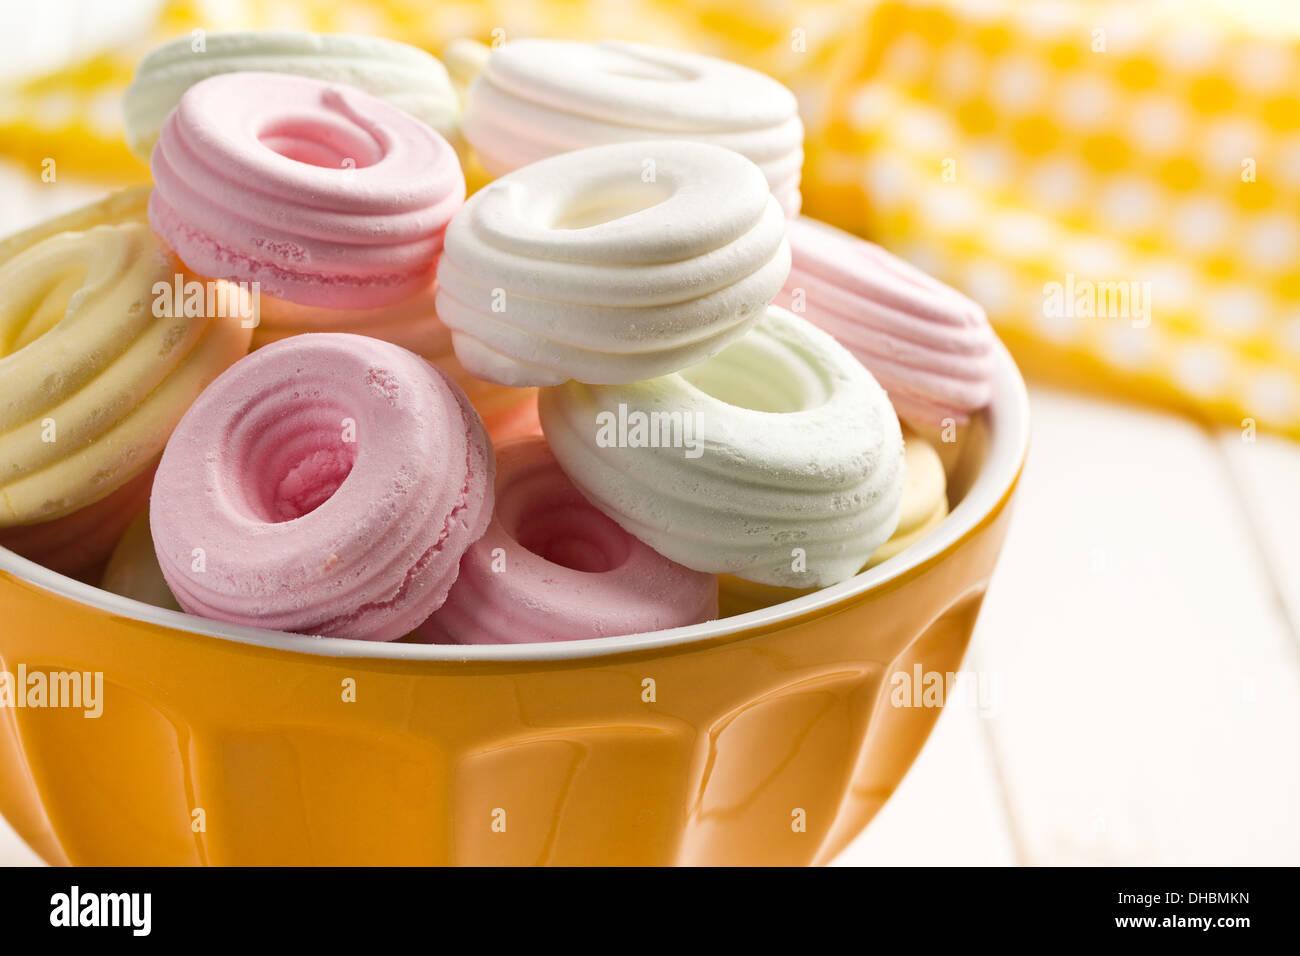 colorful meringues in ceramic bowl - Stock Image